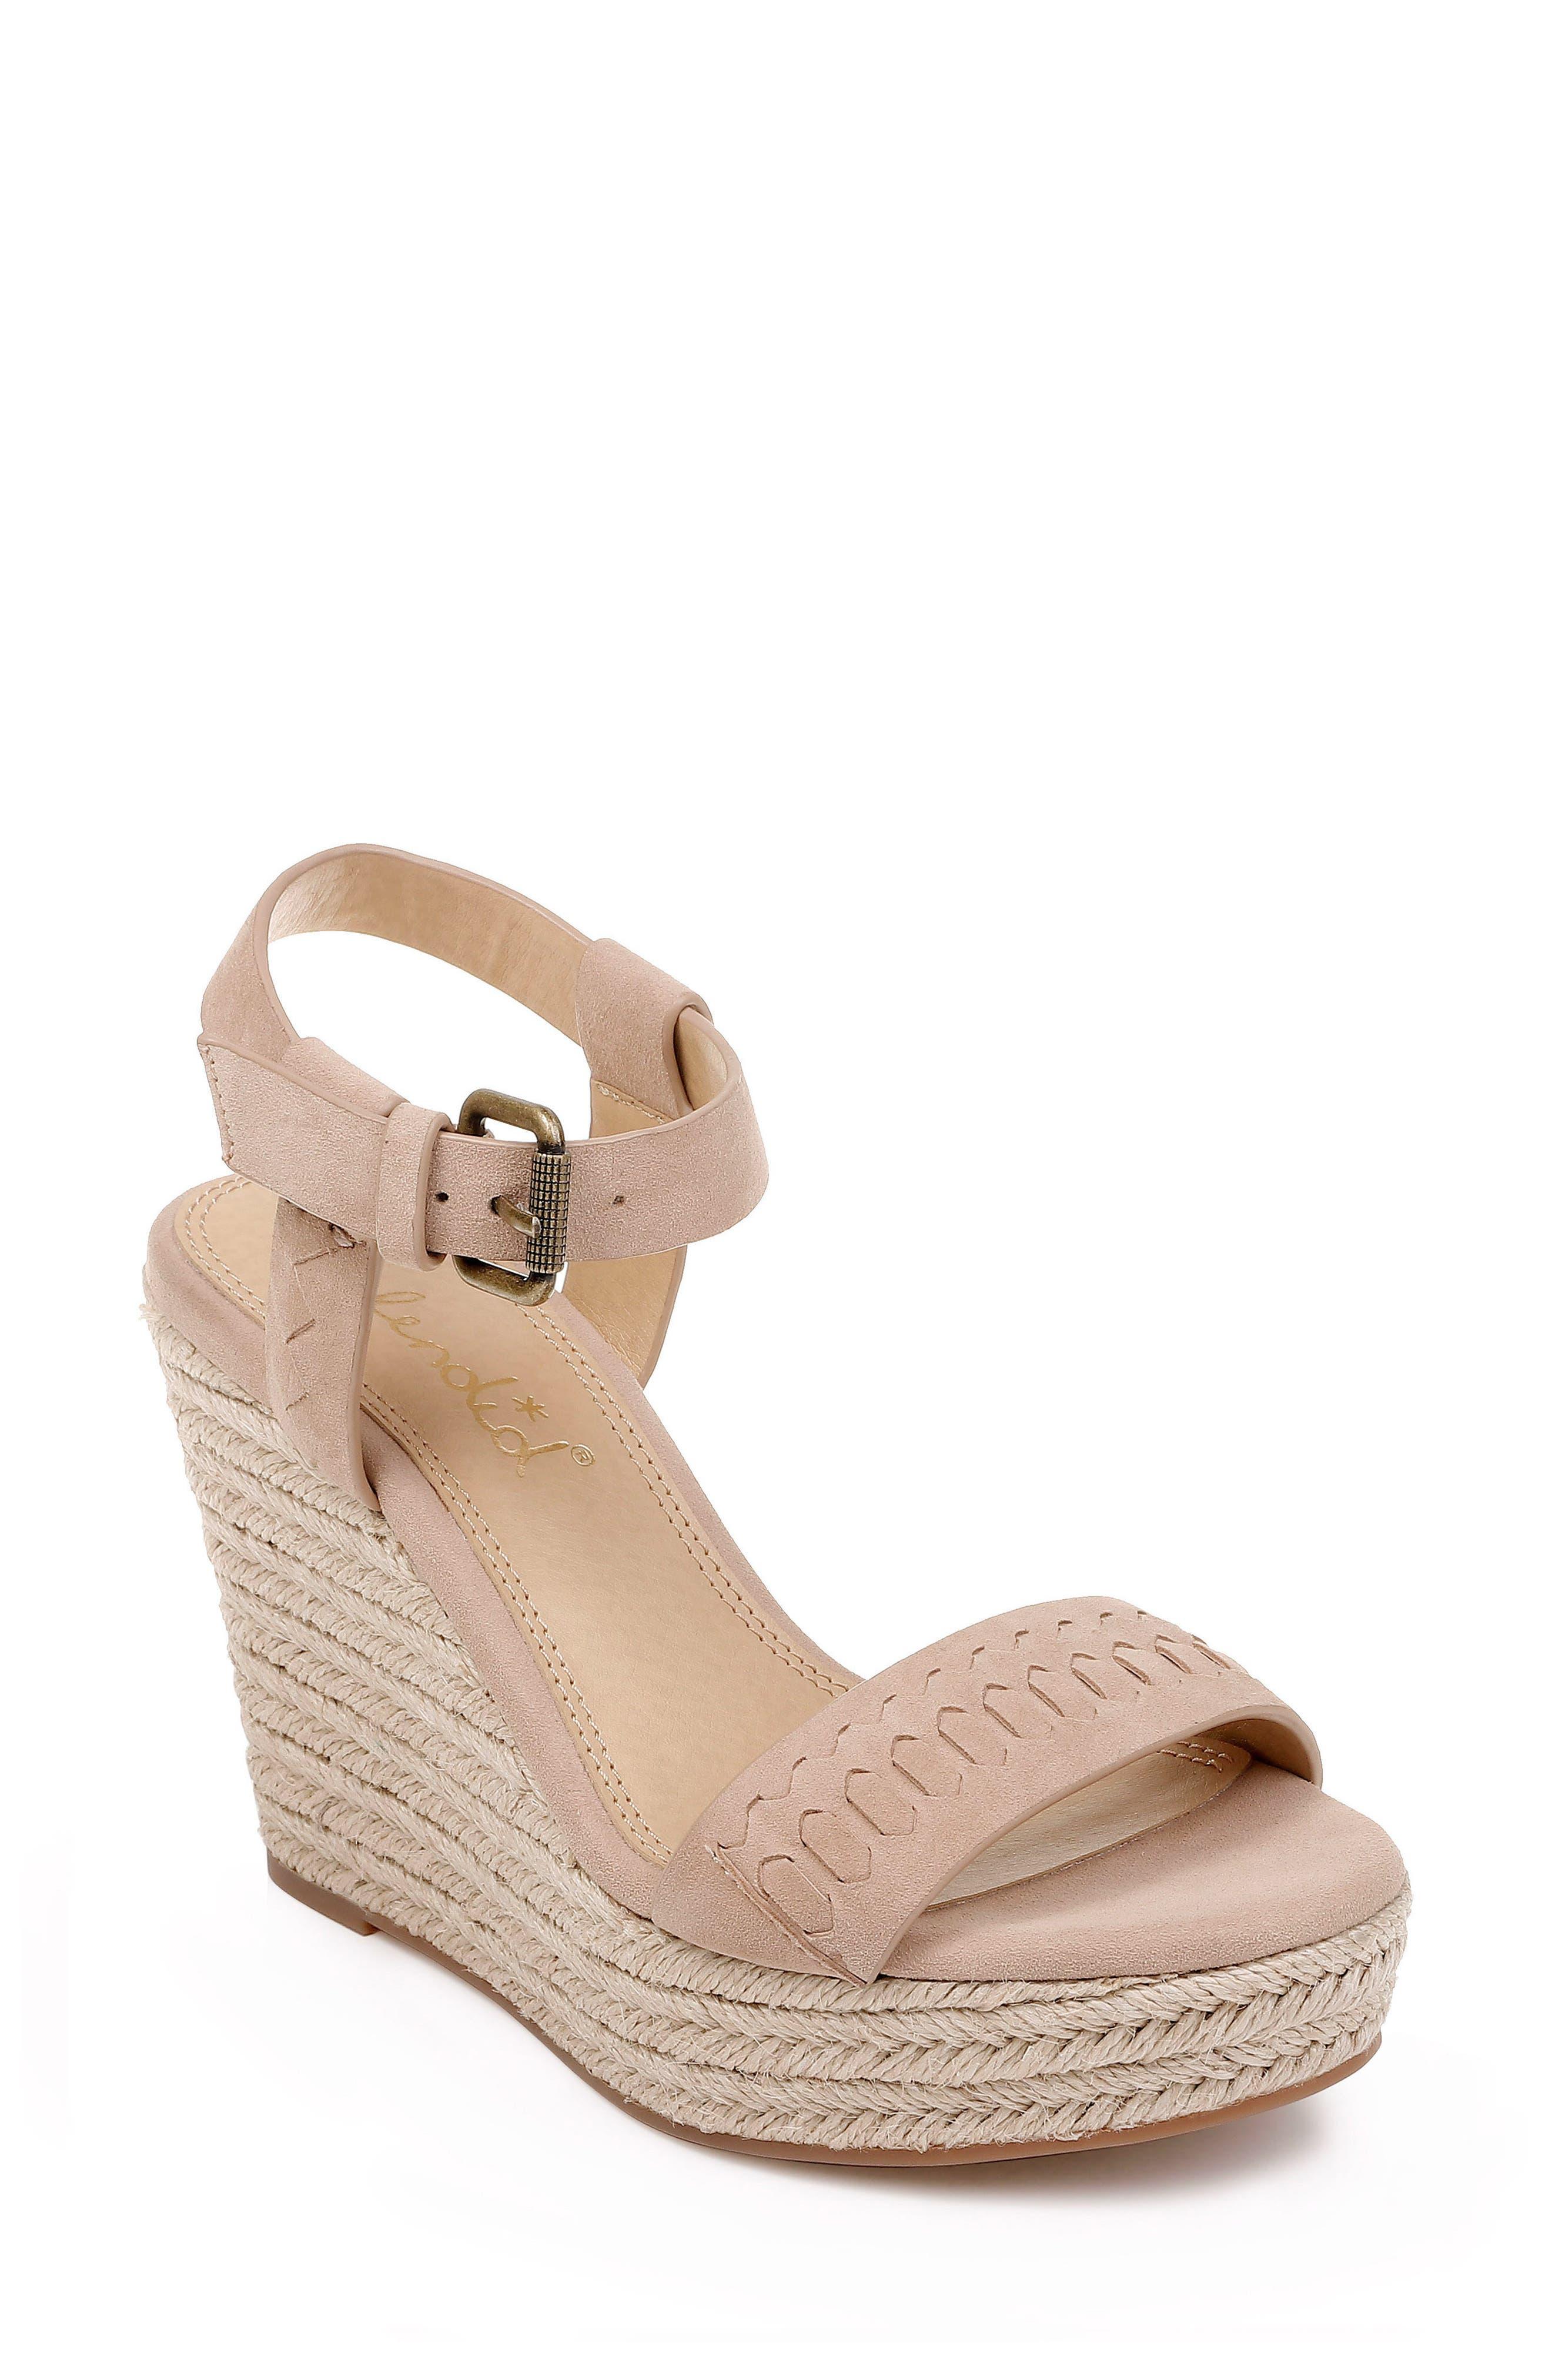 SPLENDID Shayla Woven Wedge Sandal, Main, color, WOOD SUEDE